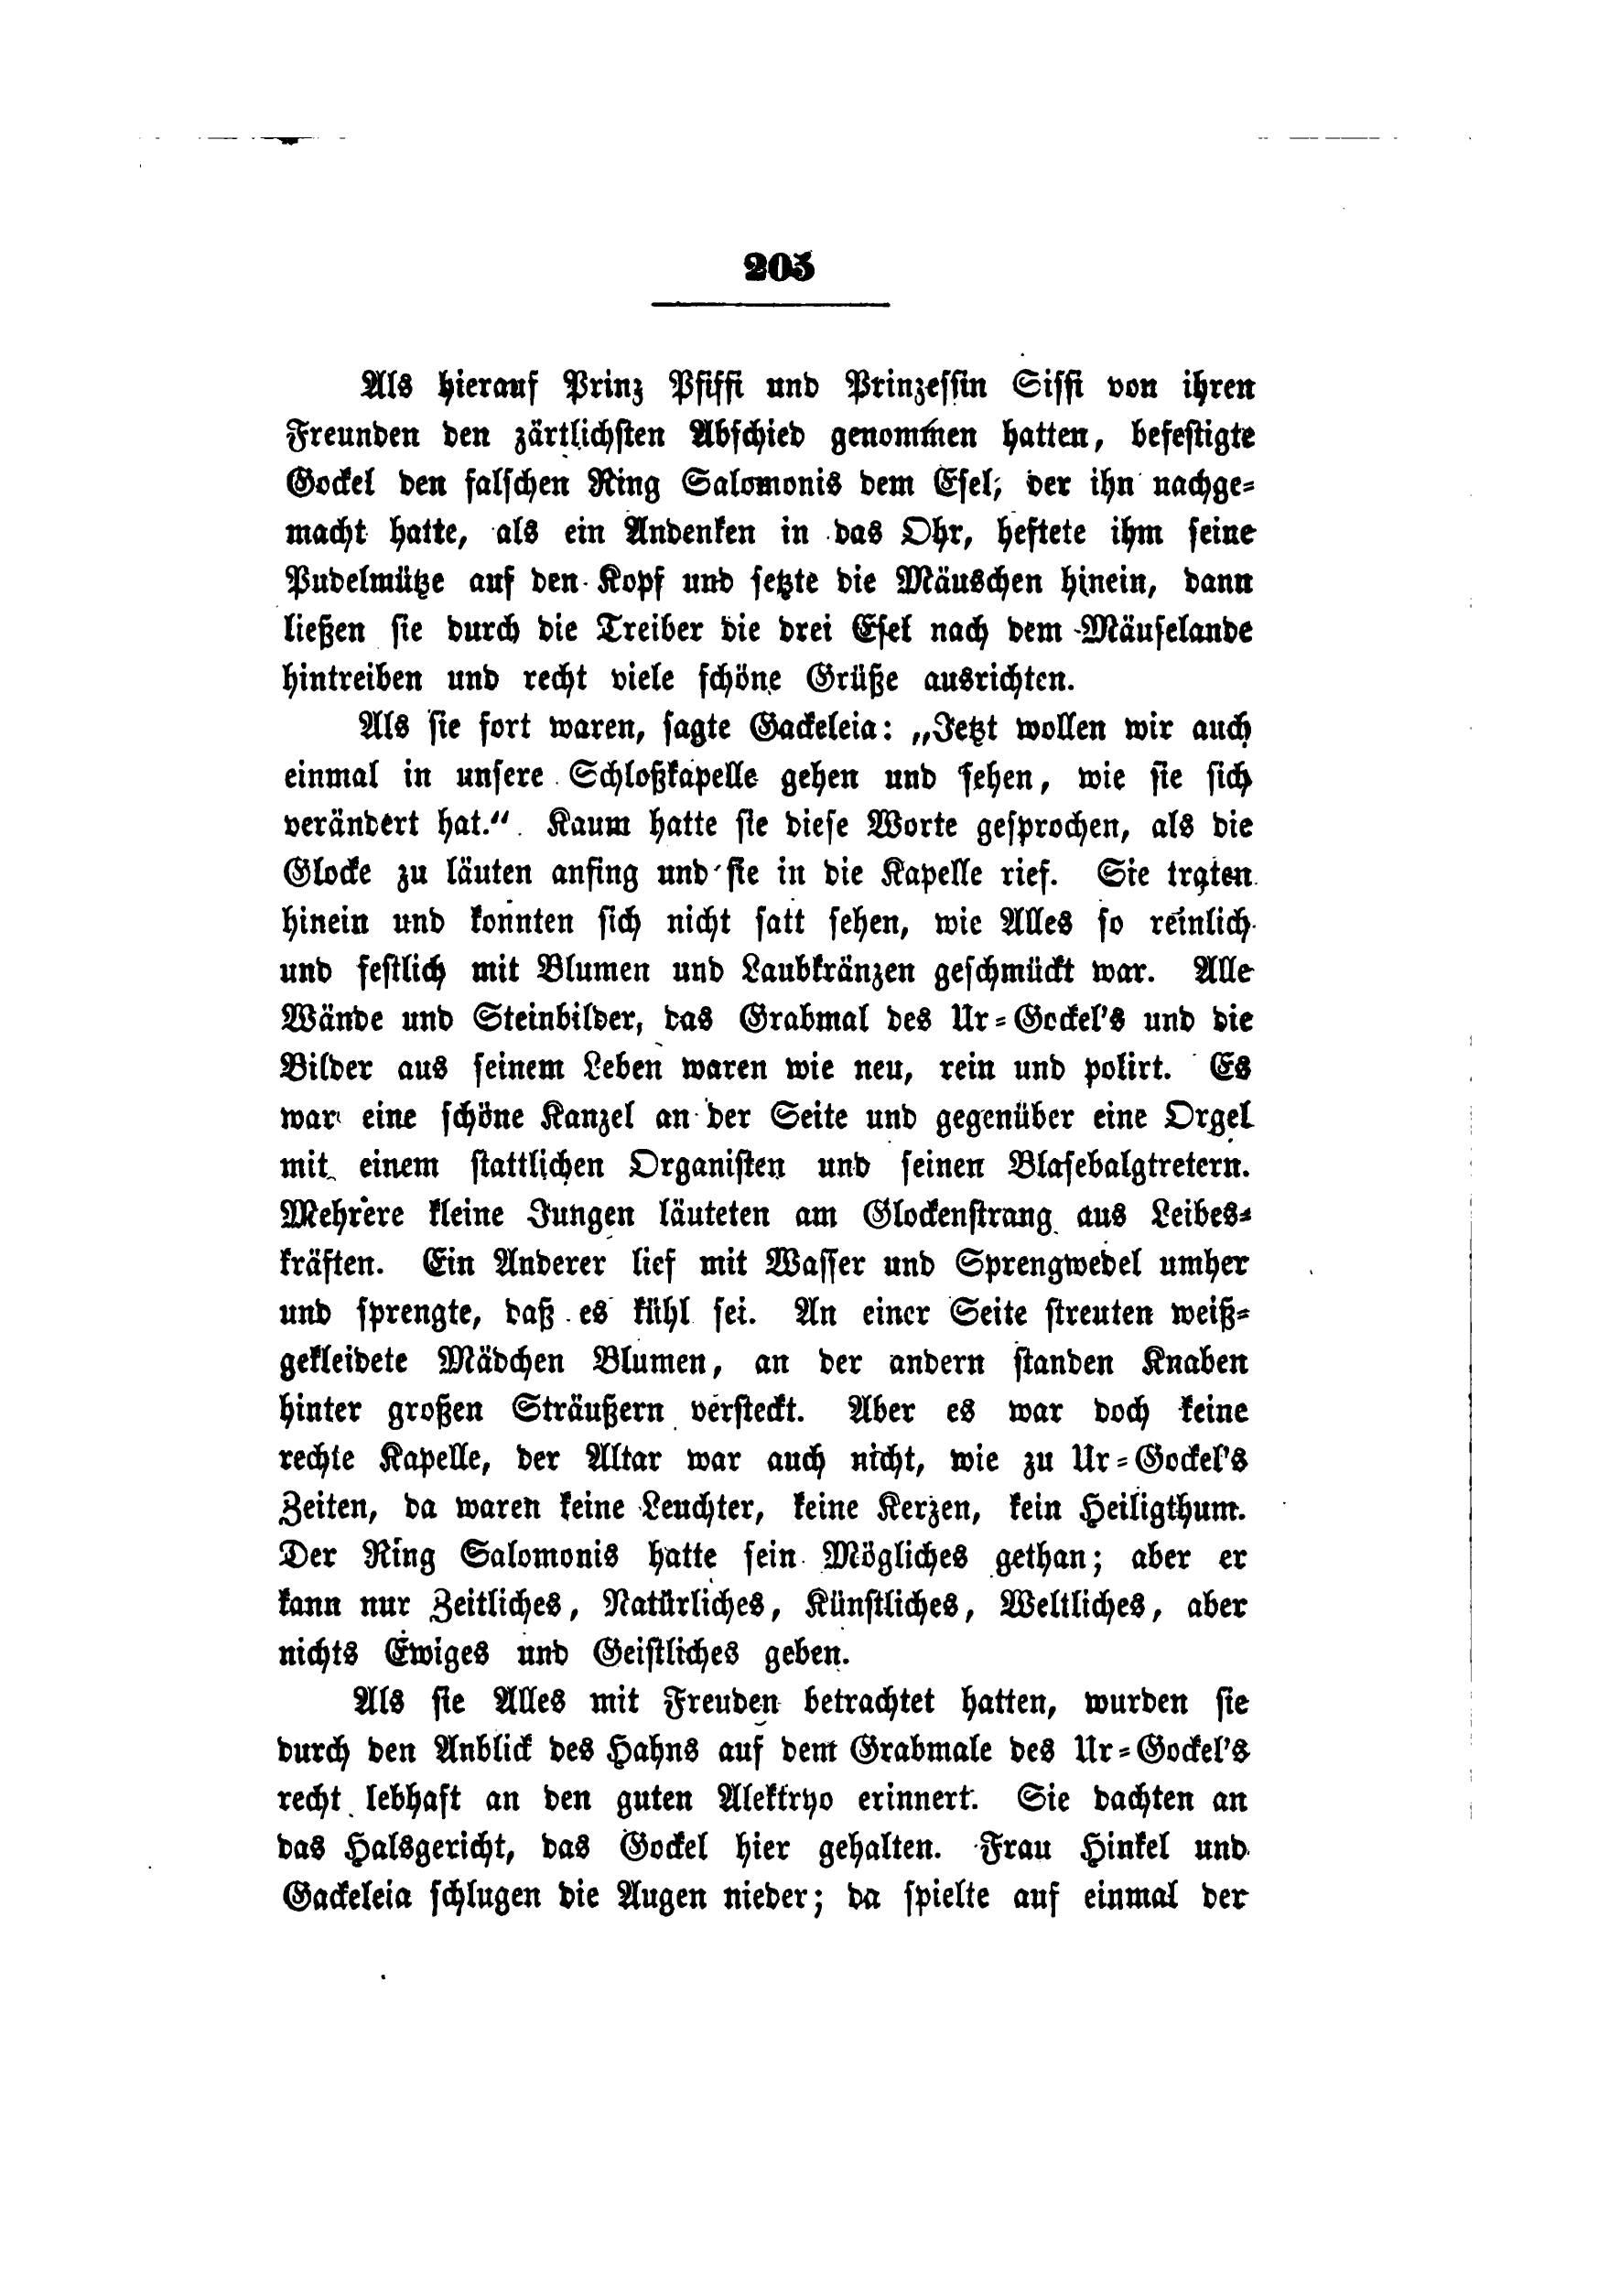 File Clemens Brentano S Gesammelte Schriften V 205 Wikimedia